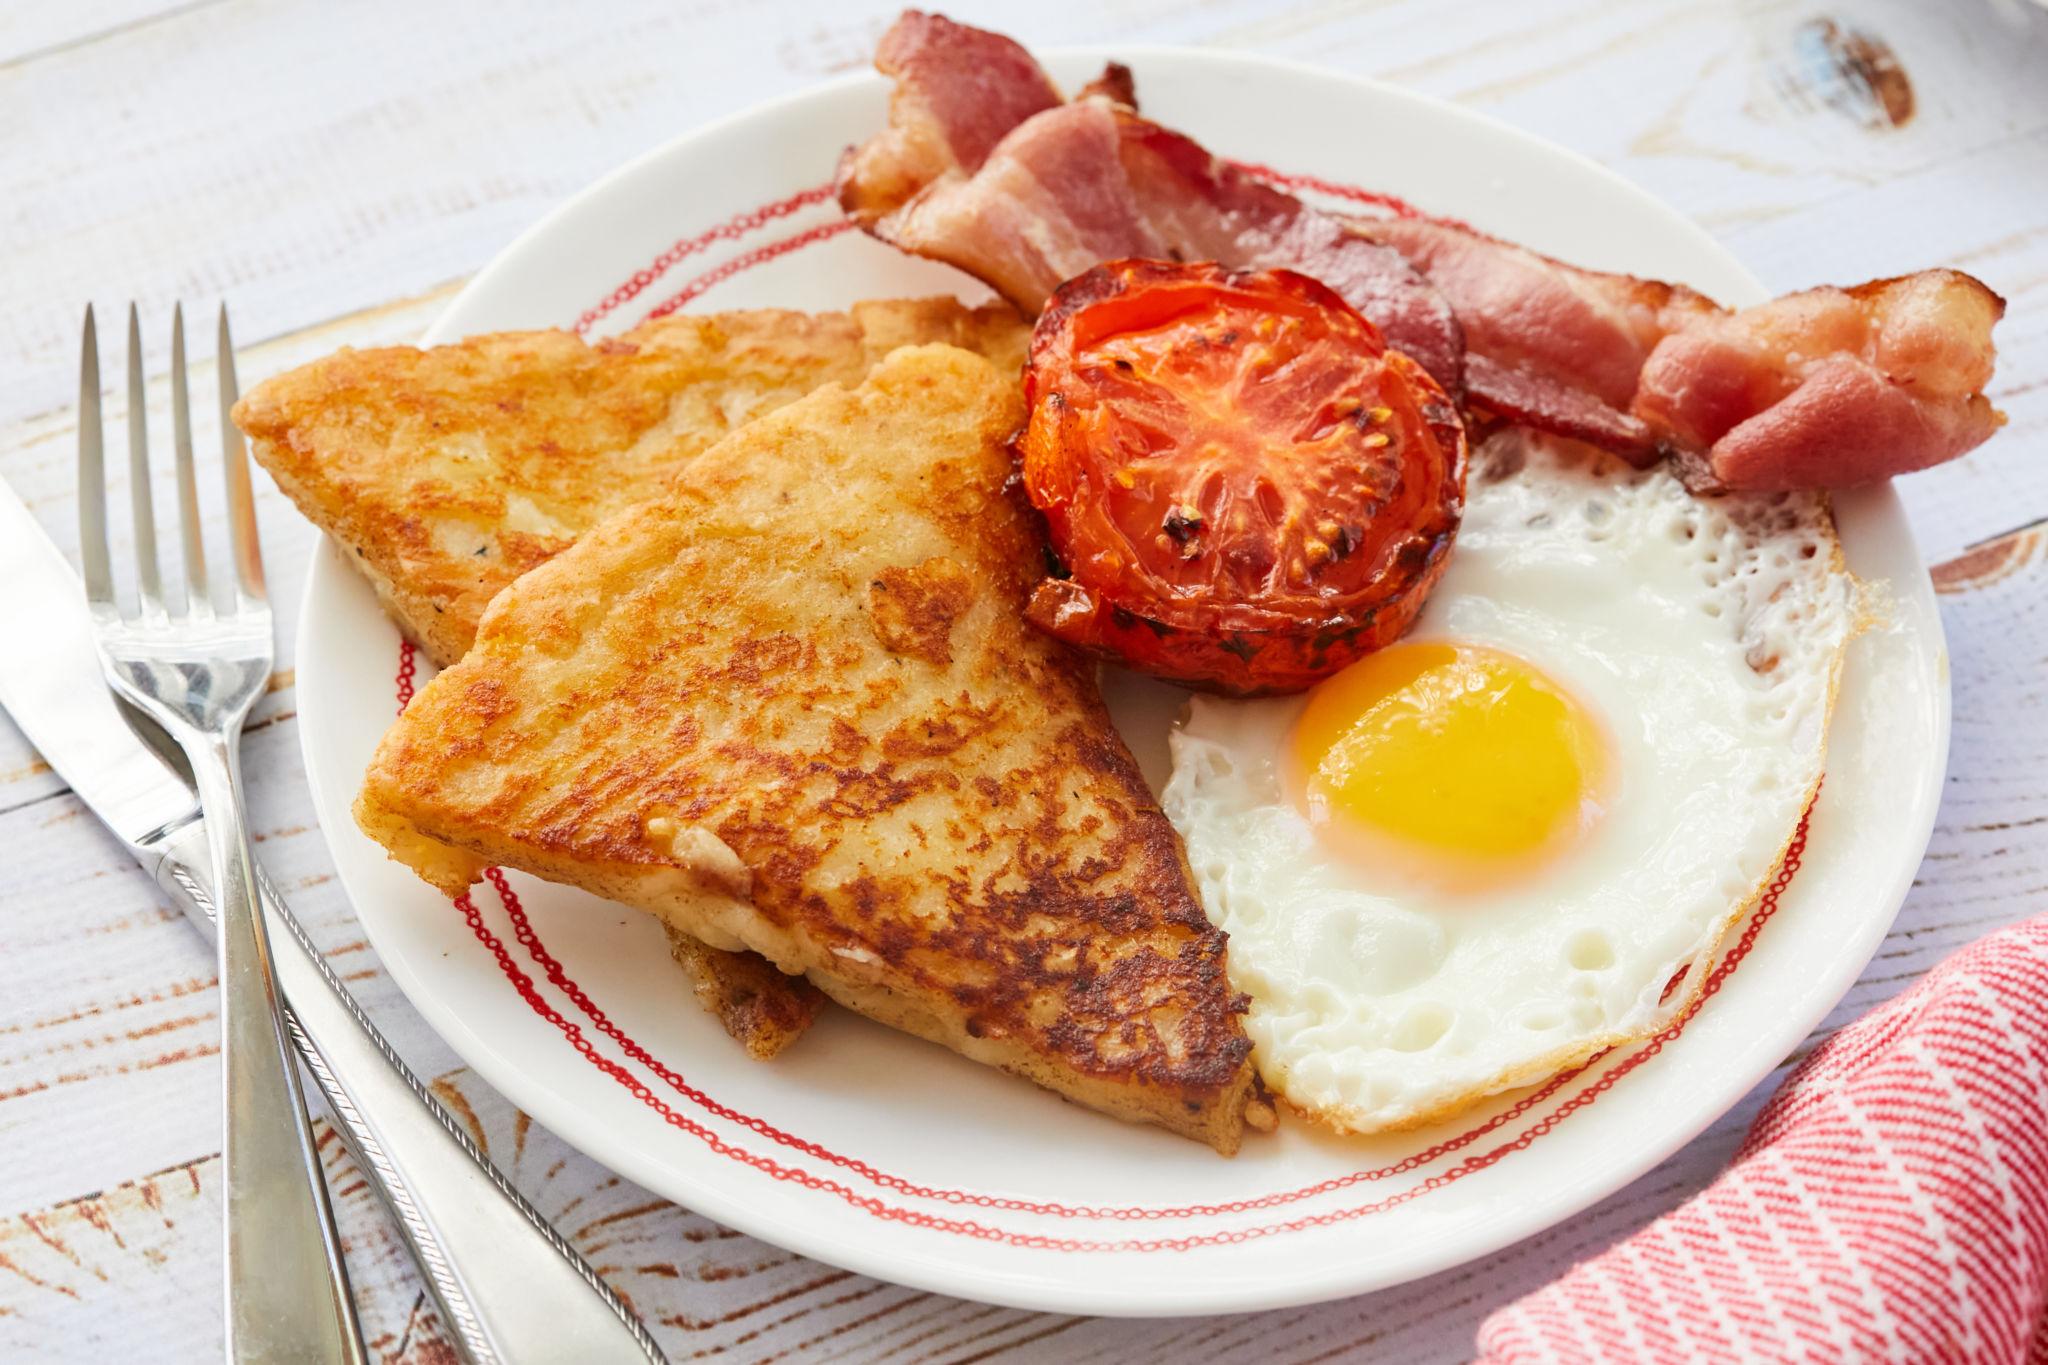 Potato Farls, also known as Potato Cakes, with eggs, bacon, and tomatoes.